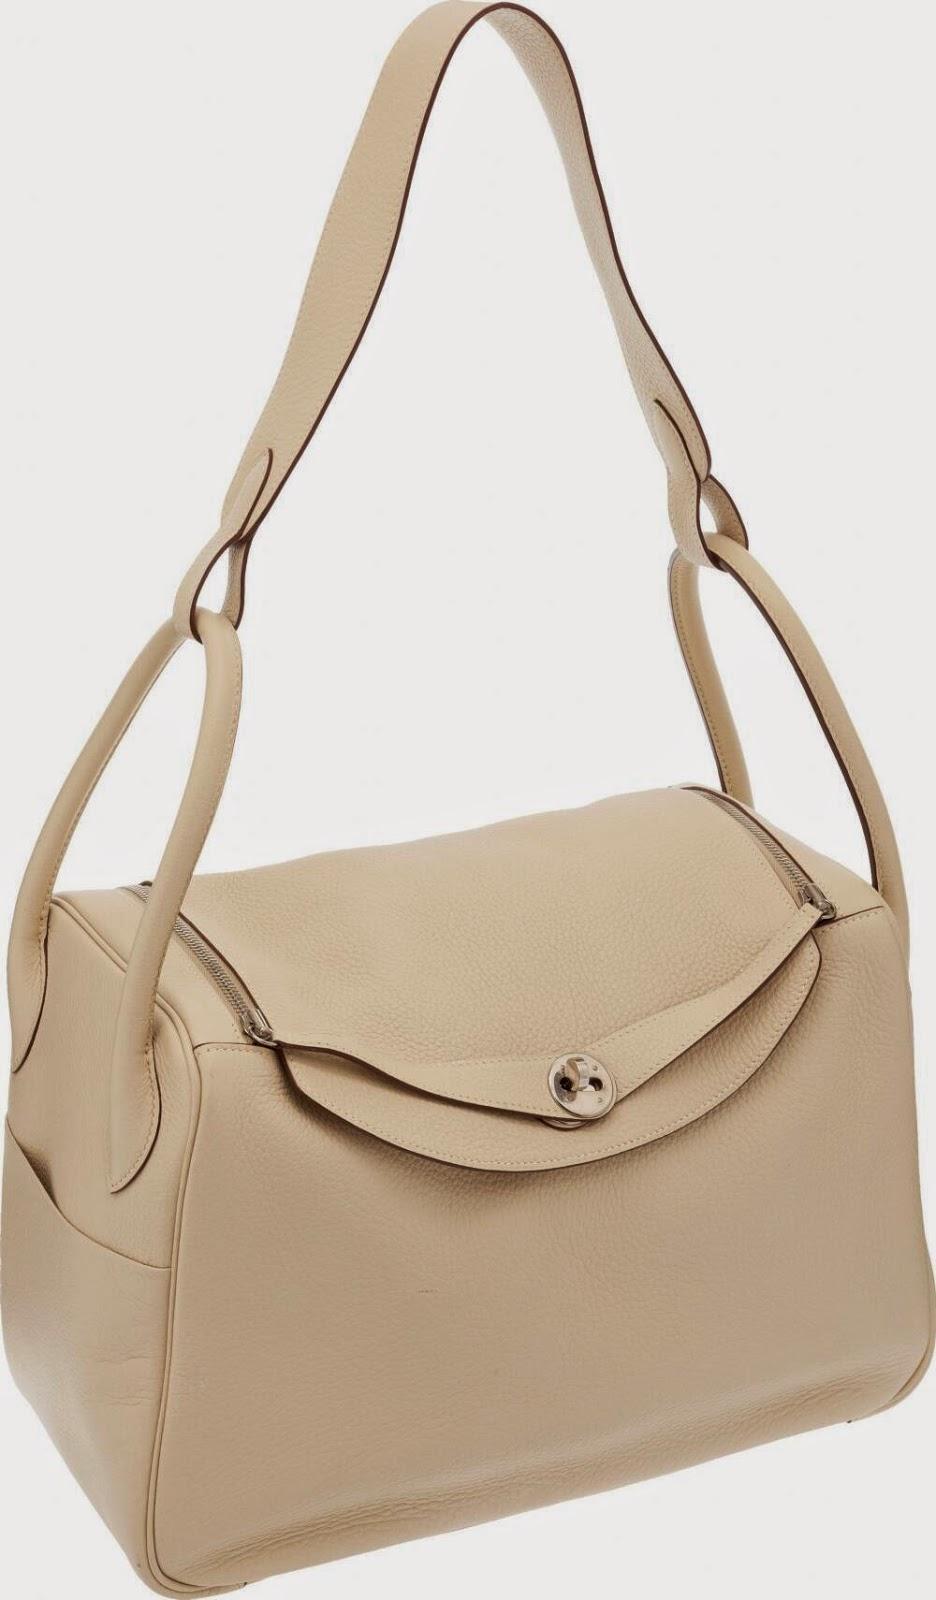 5b5b5f1b3b0 Hermes Kelly clutch bag,Hermes Lindy bag and Hermes Birkin bag ...